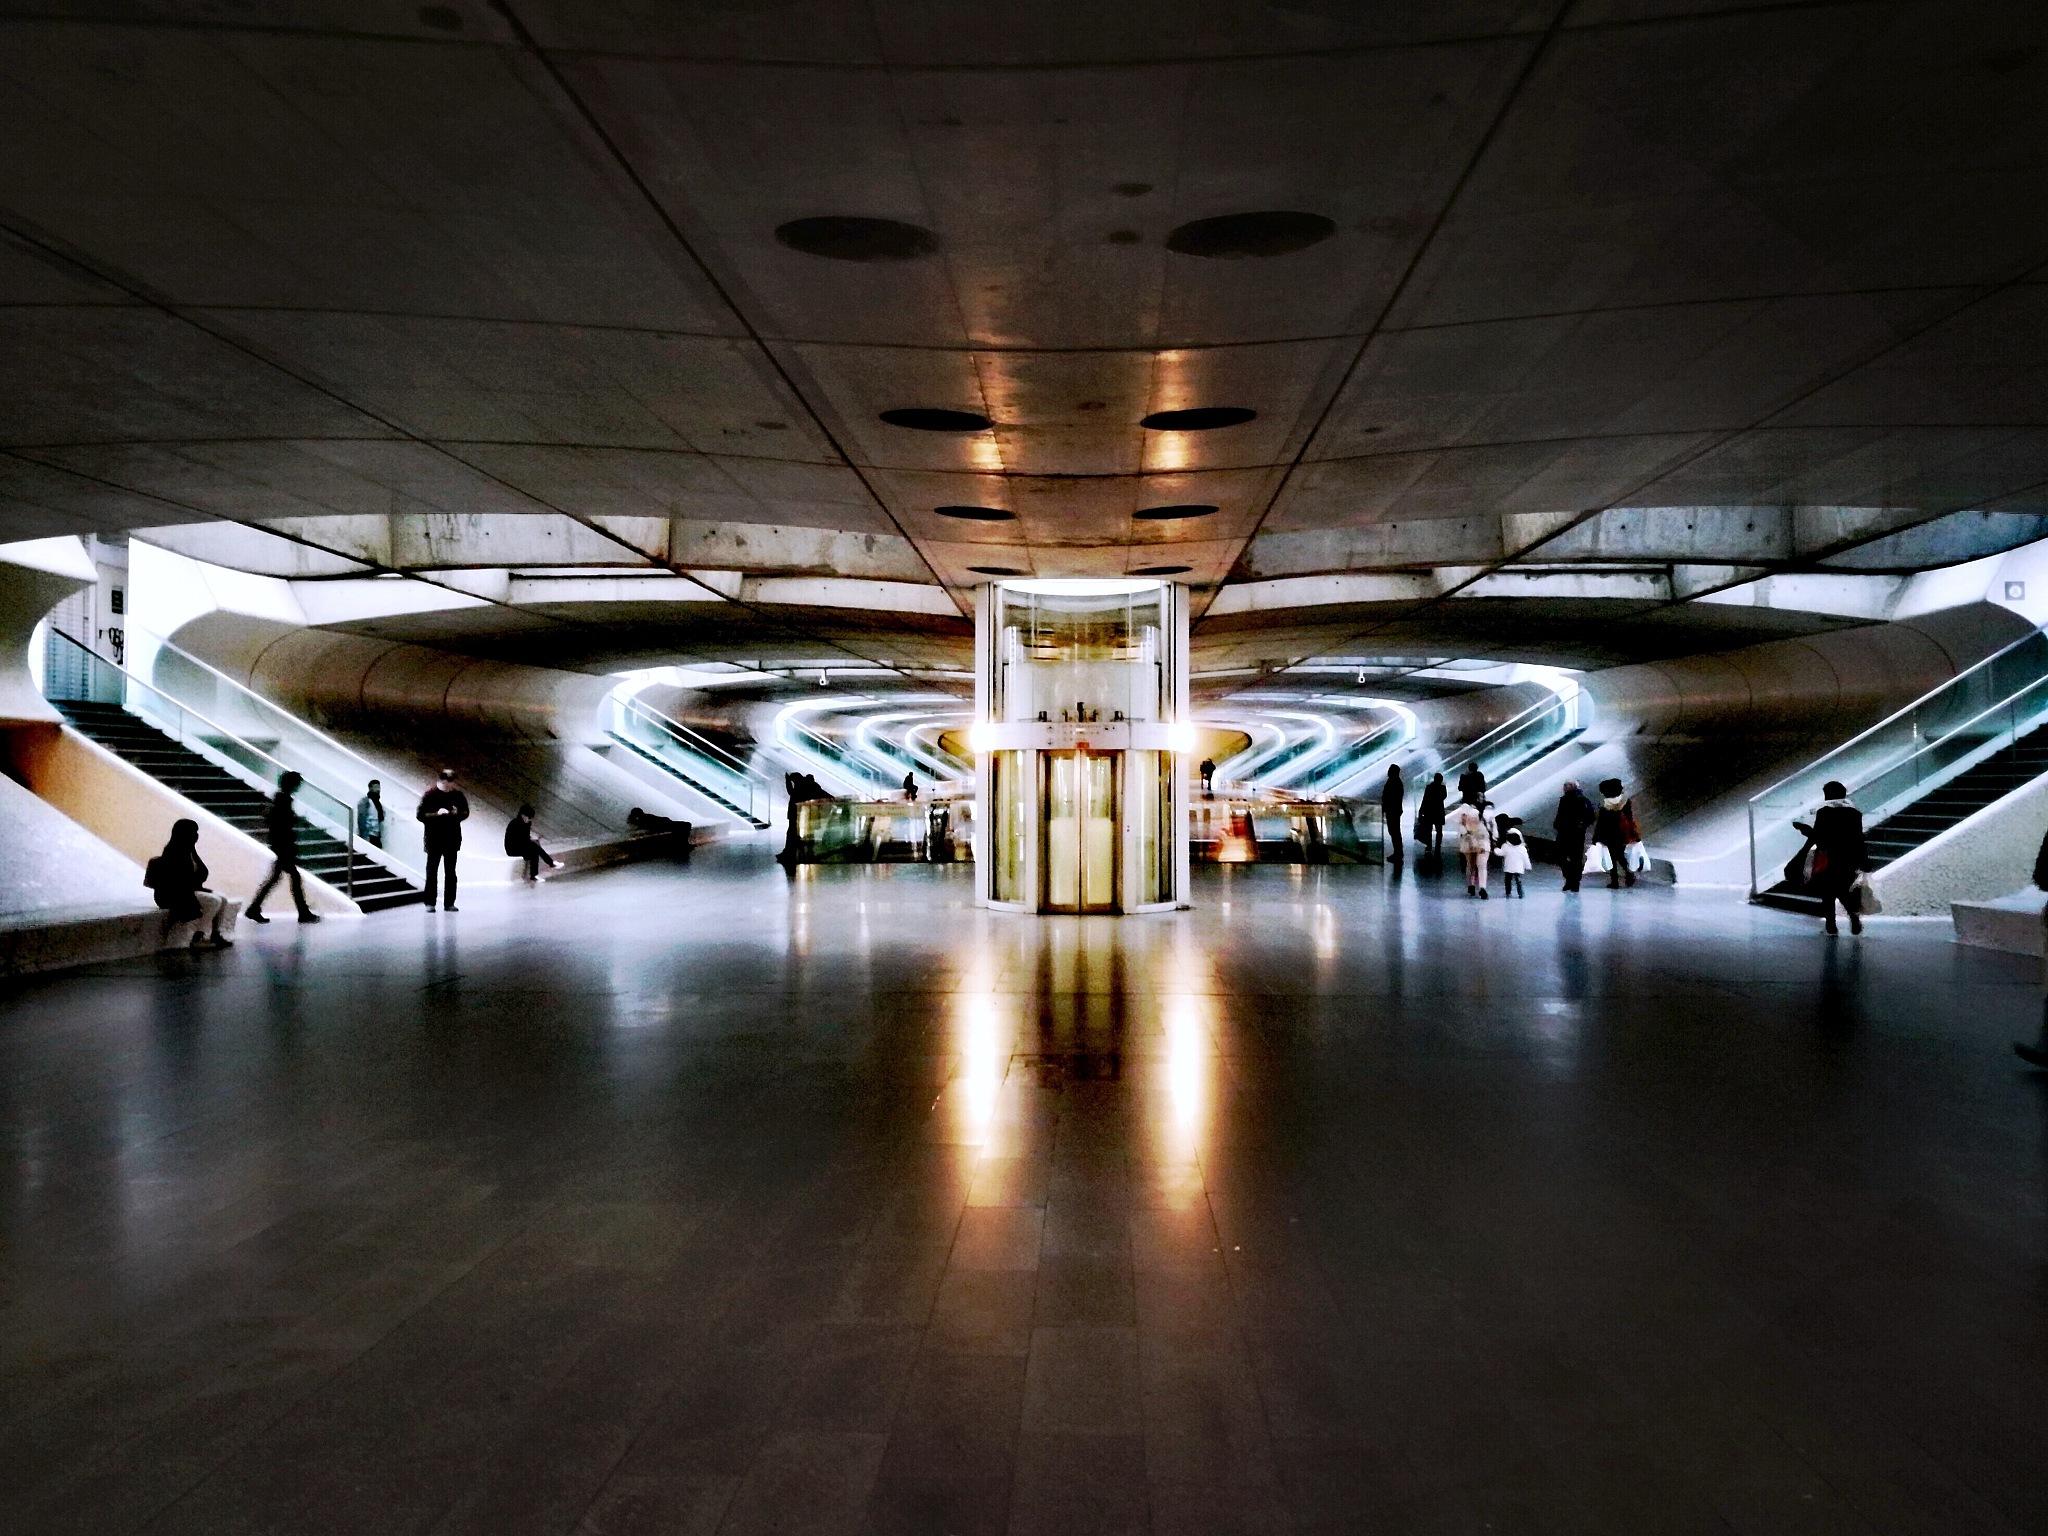 Smartografando pela cidade by Viking Tuga